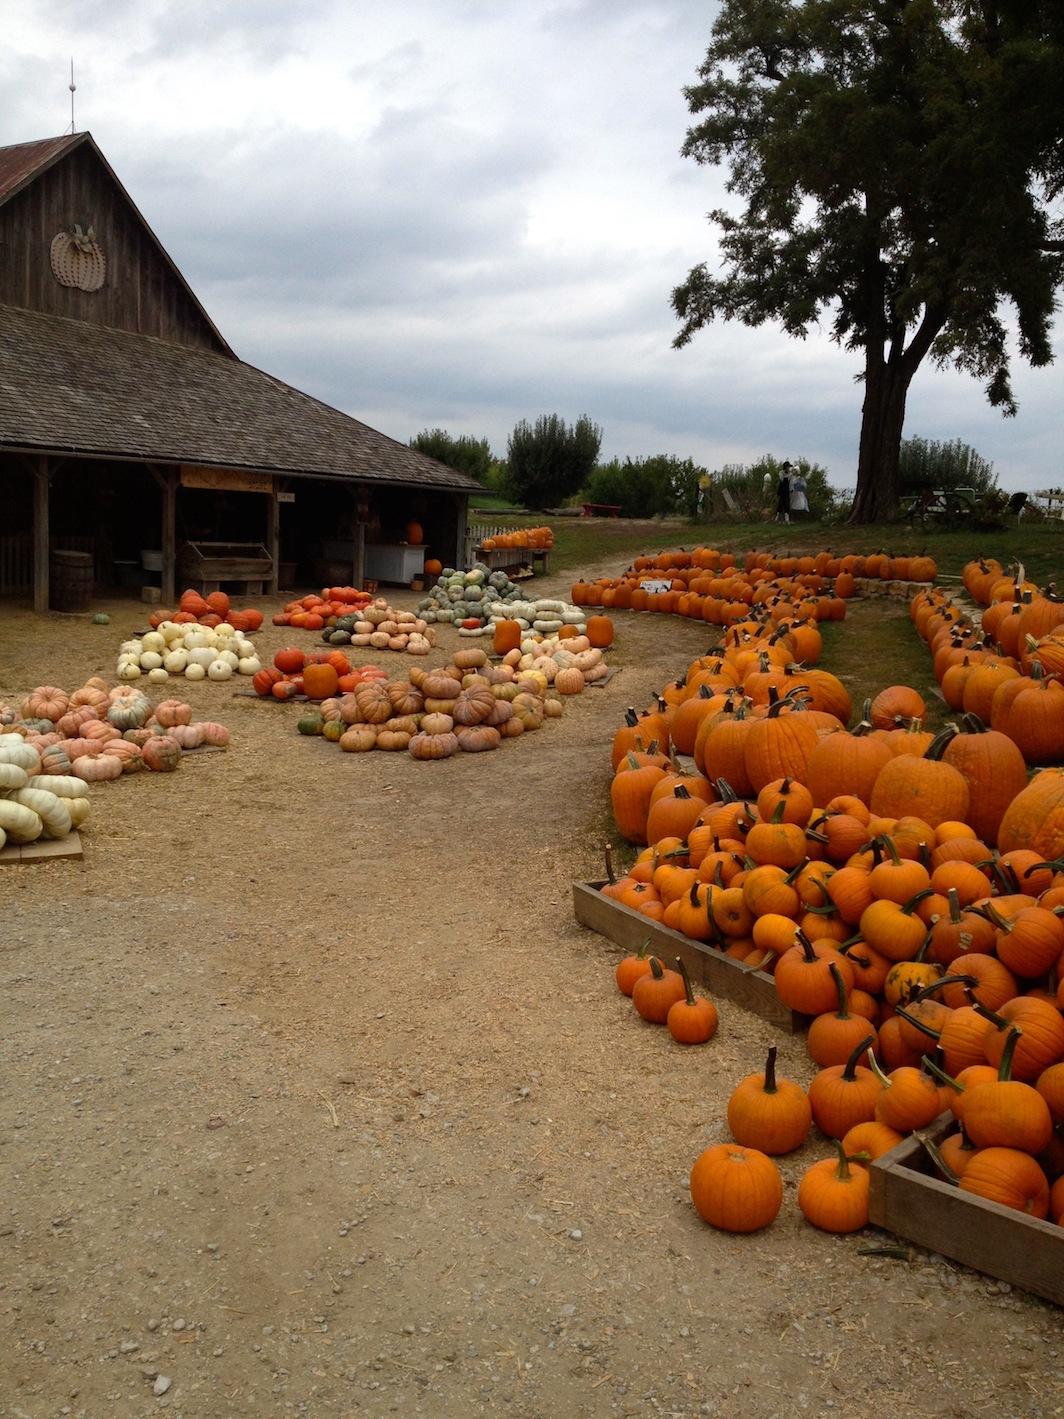 Weston Red Barn Farm, Pumpkin Patch, pumpkins, autumn ...